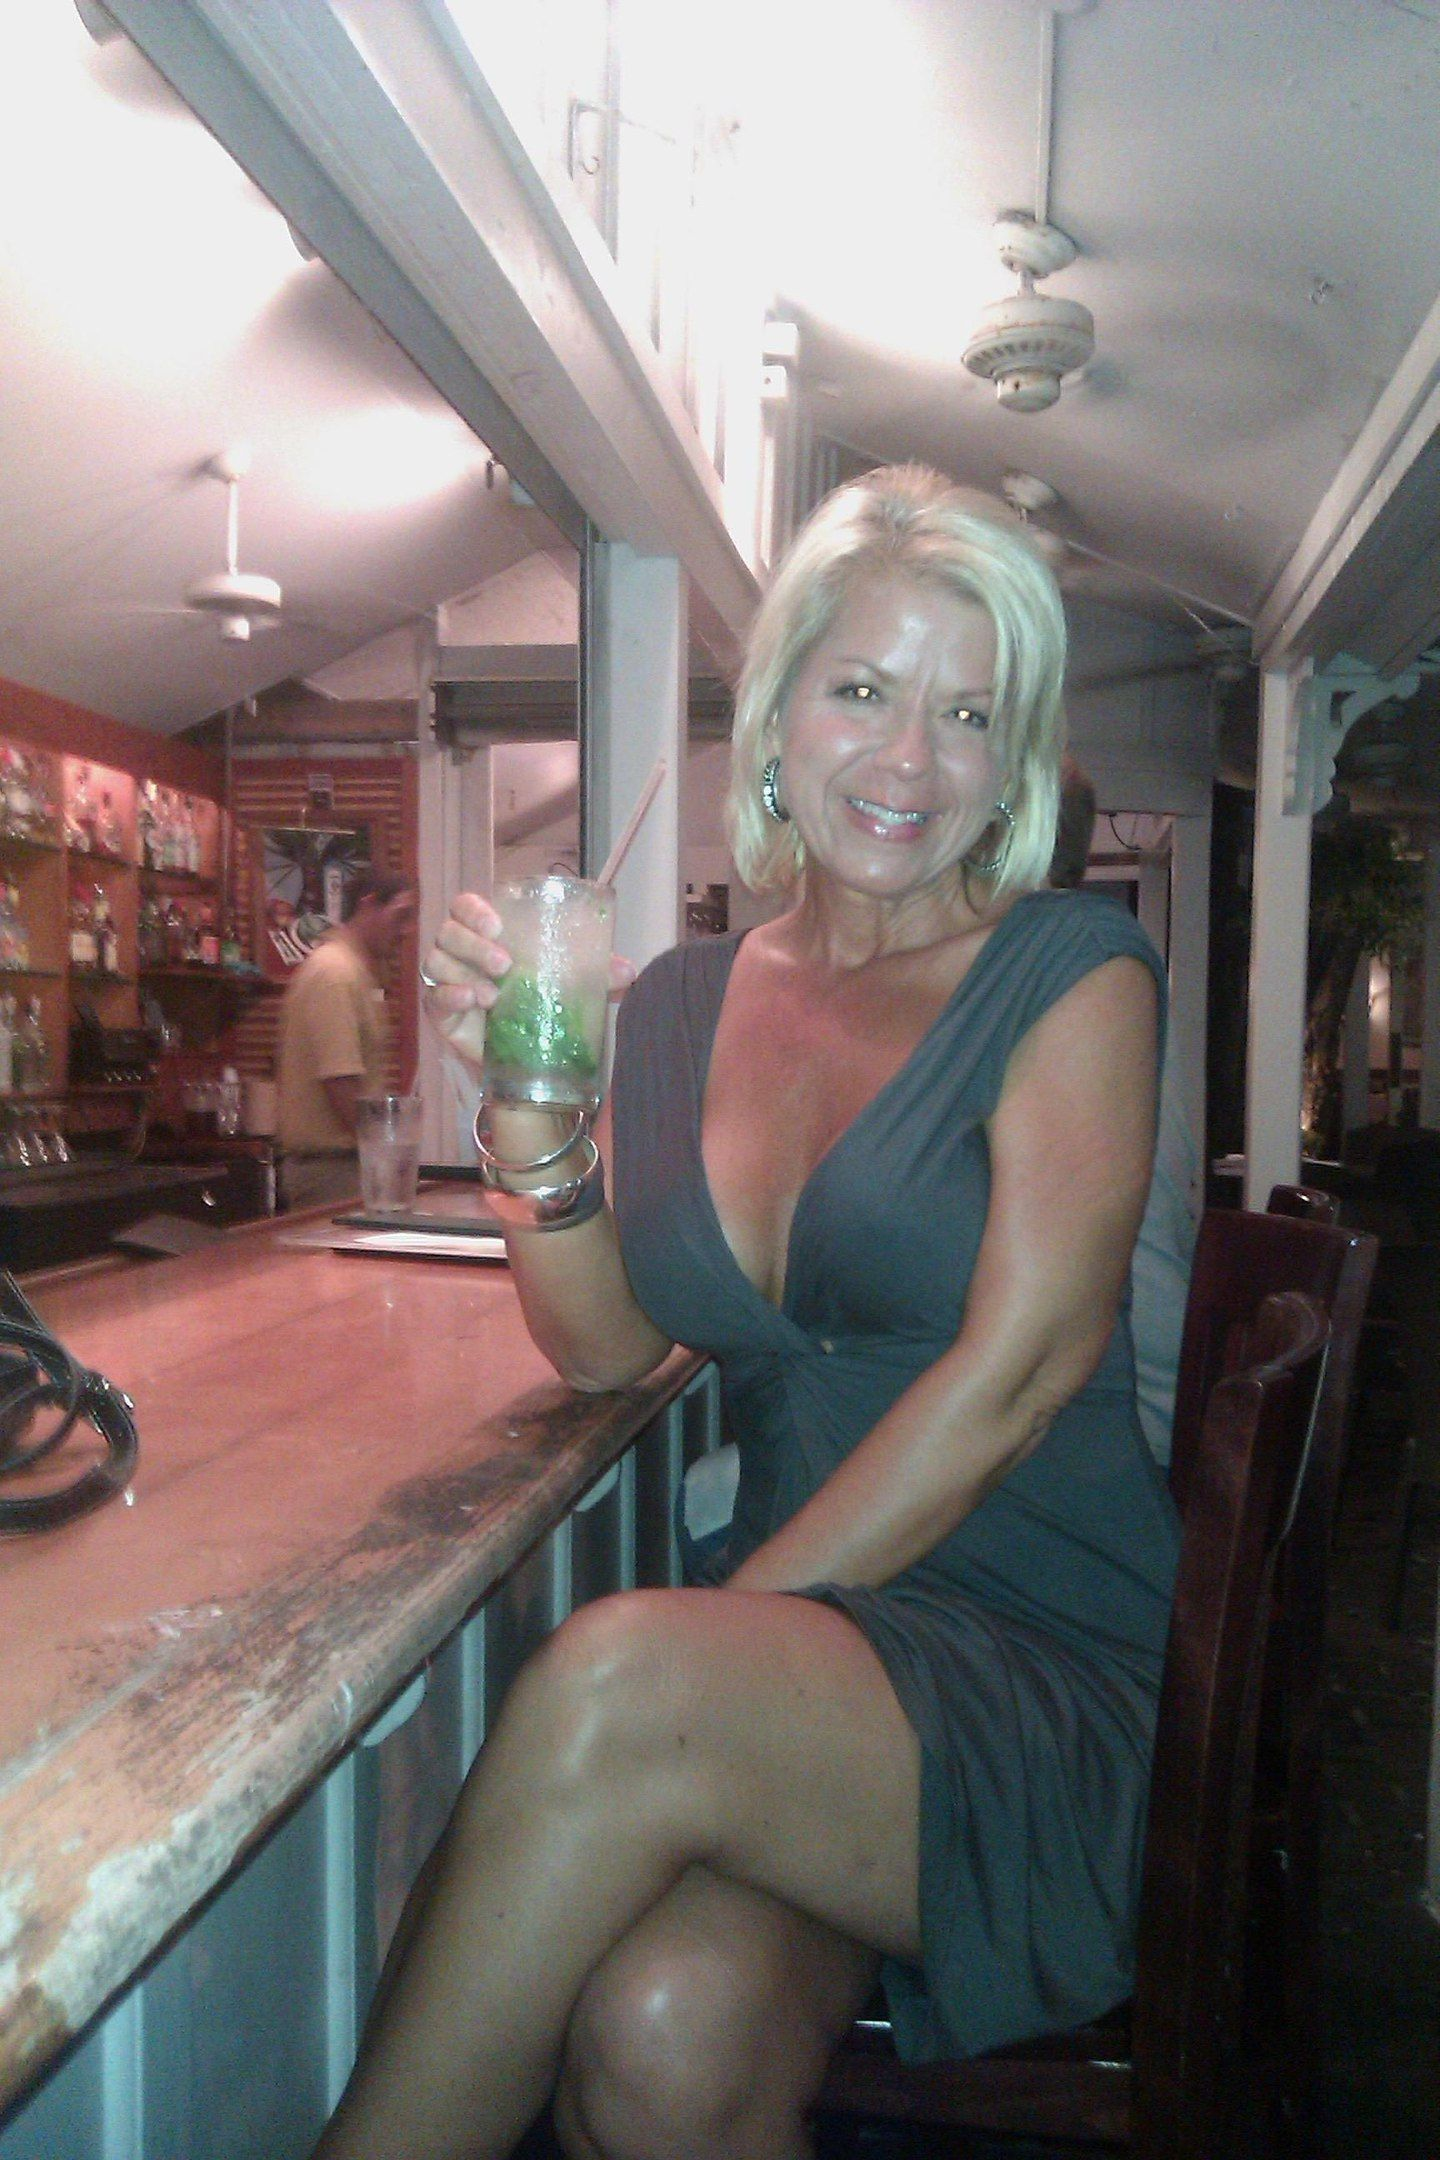 pinrob steed on hot women drinking | pinterest | woman